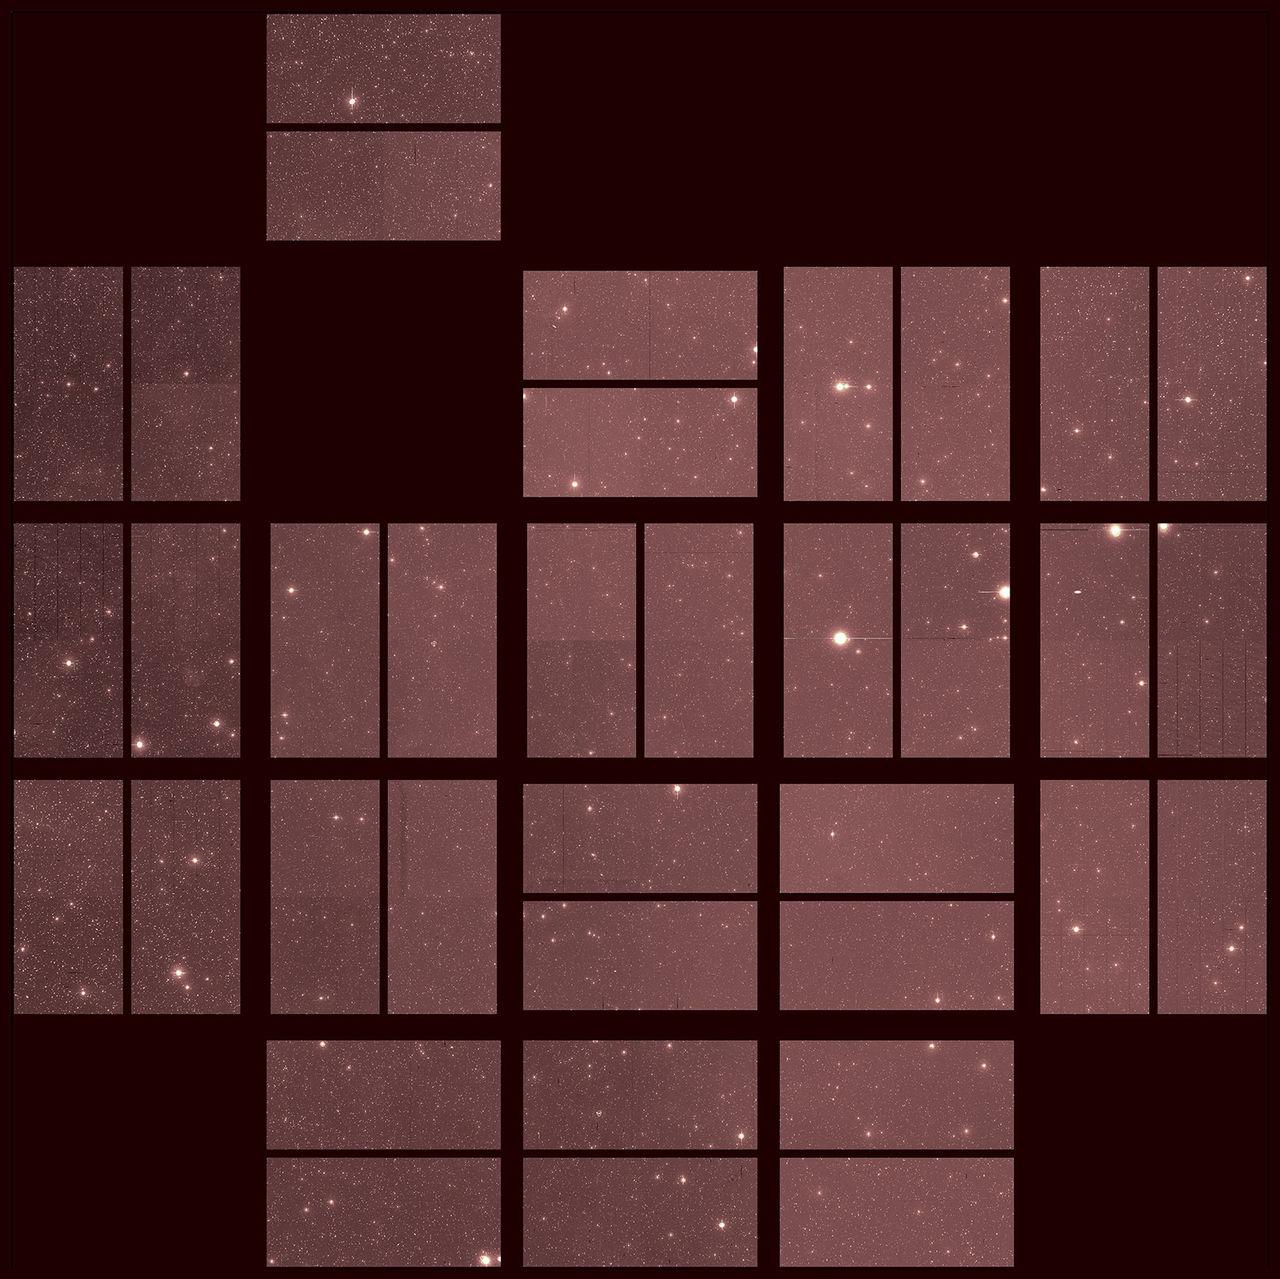 Keplerteleskopet har skickat hem sin sista bild